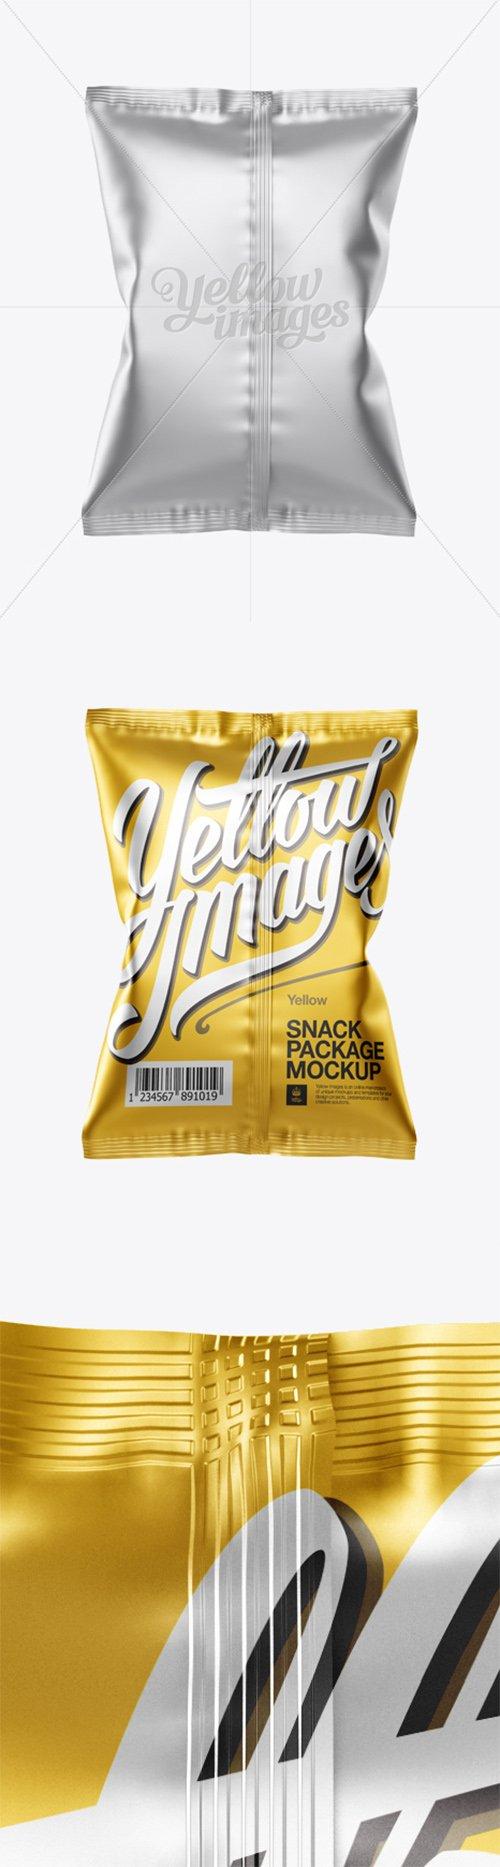 Matte Metallic Snack Package Mockup - Back View 12710 TIF